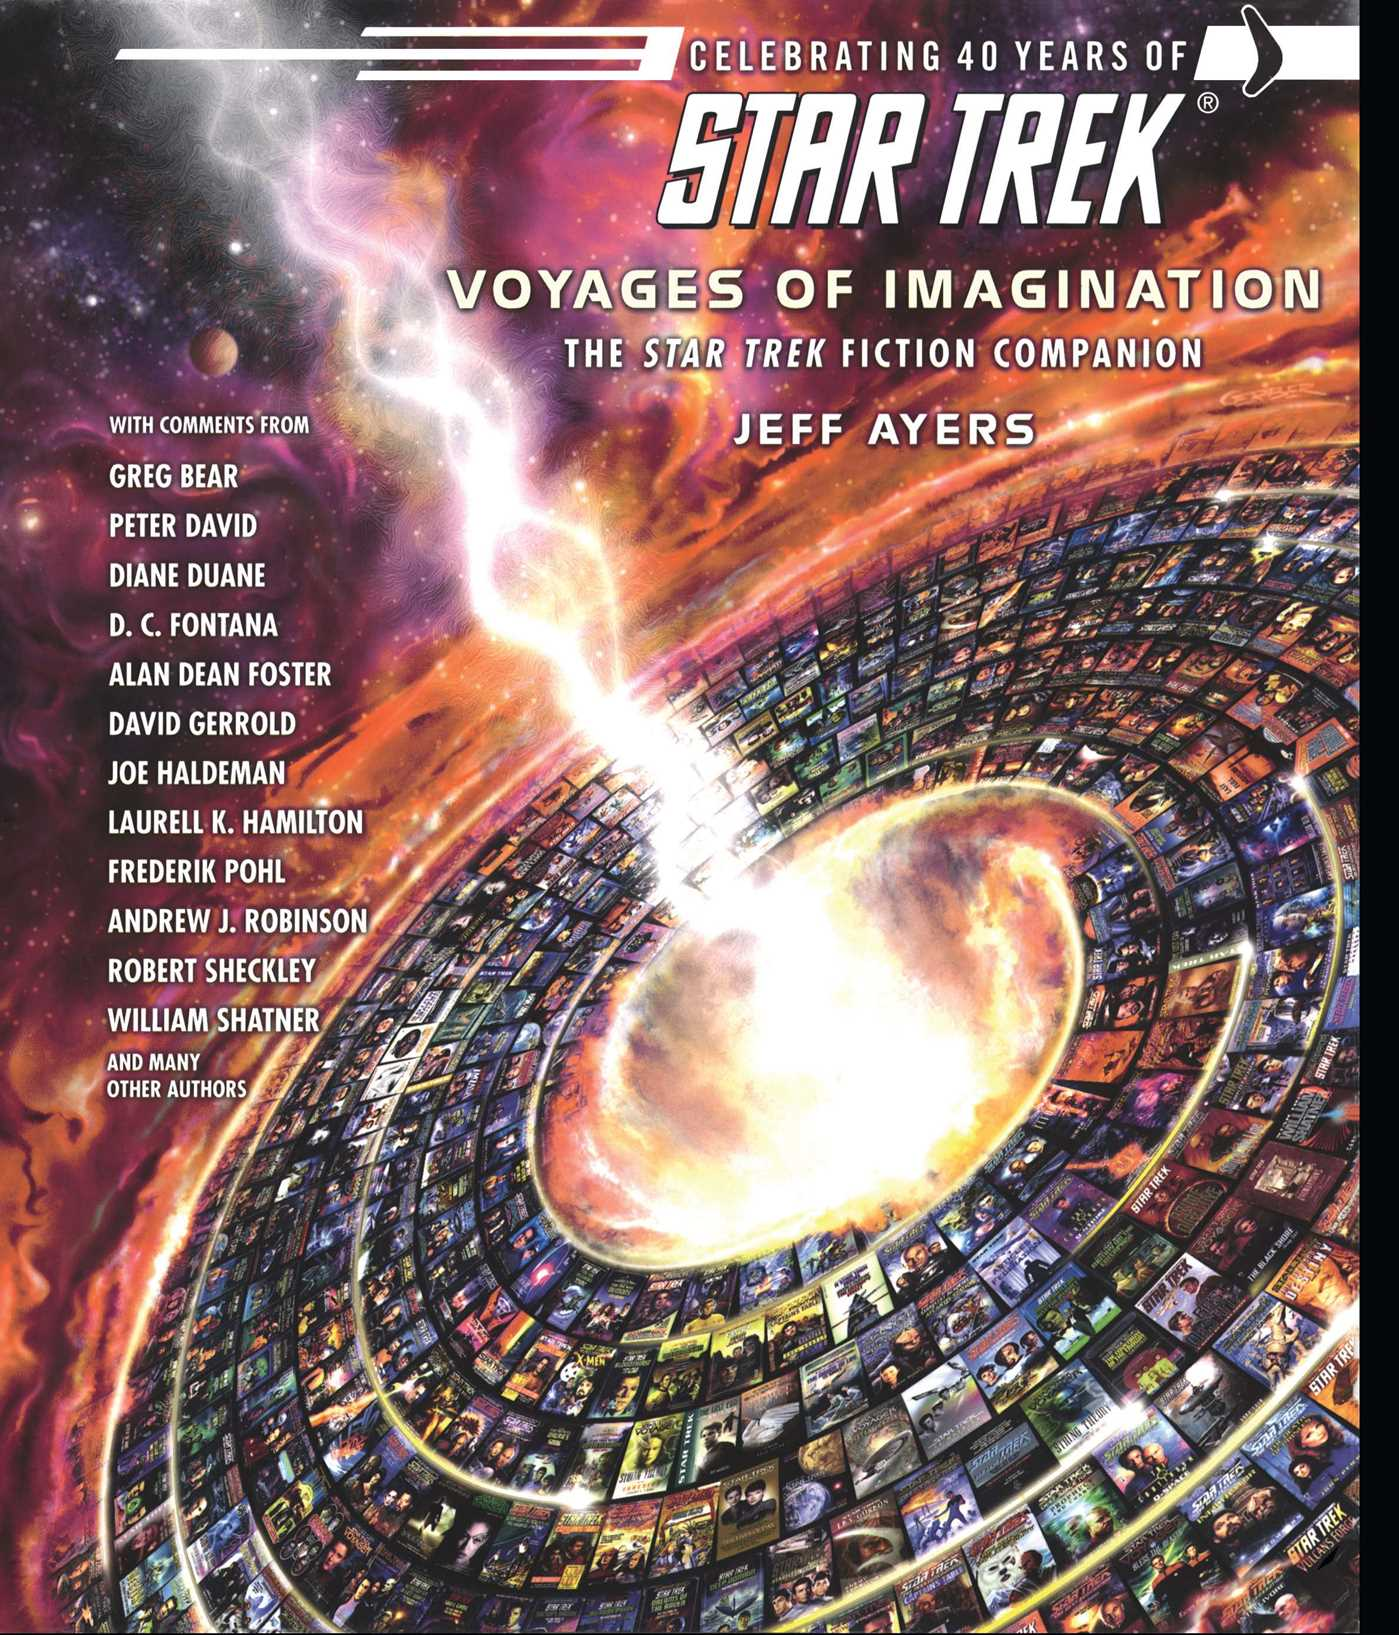 Star trek voyages of imagination the star trek fiction companion 9781416503491 hr